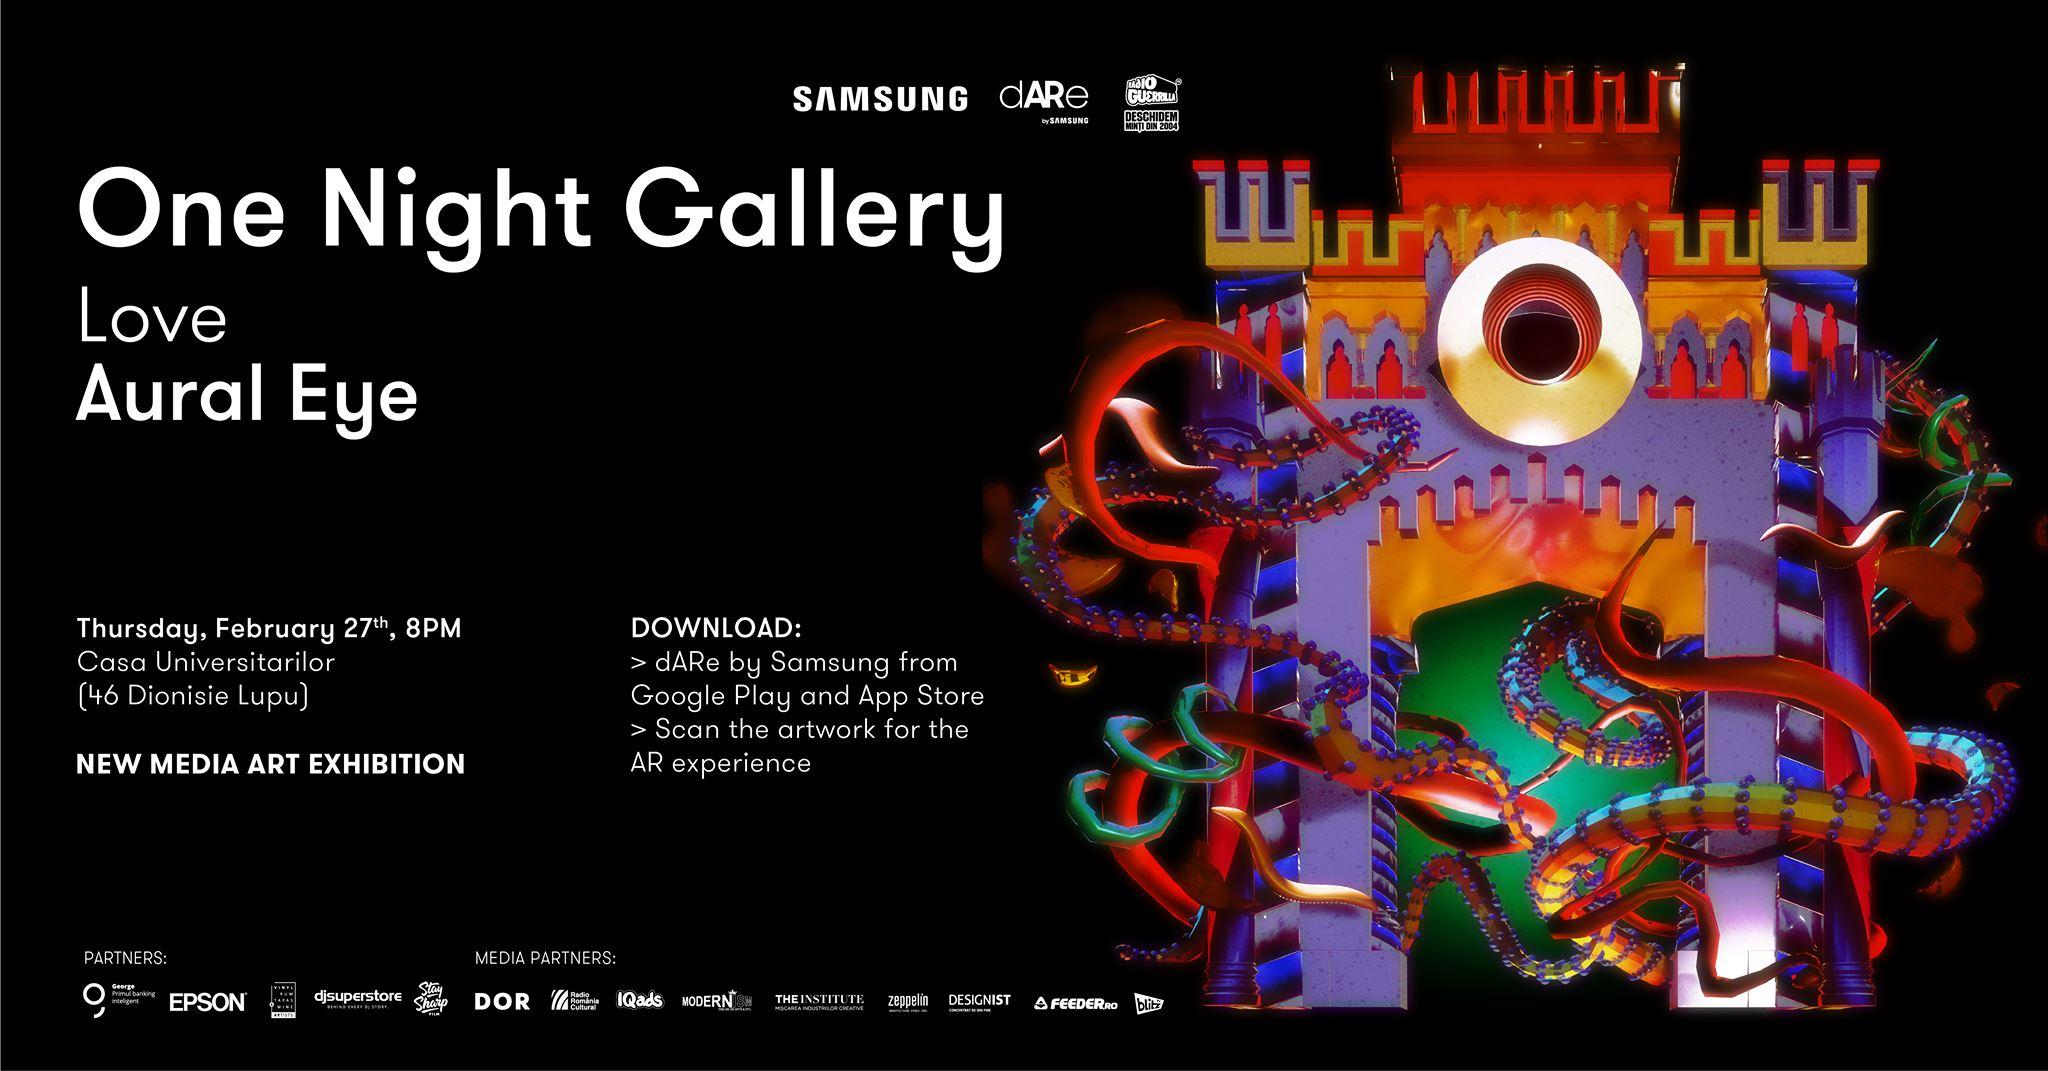 One Night Gallery // Love Aural Eye